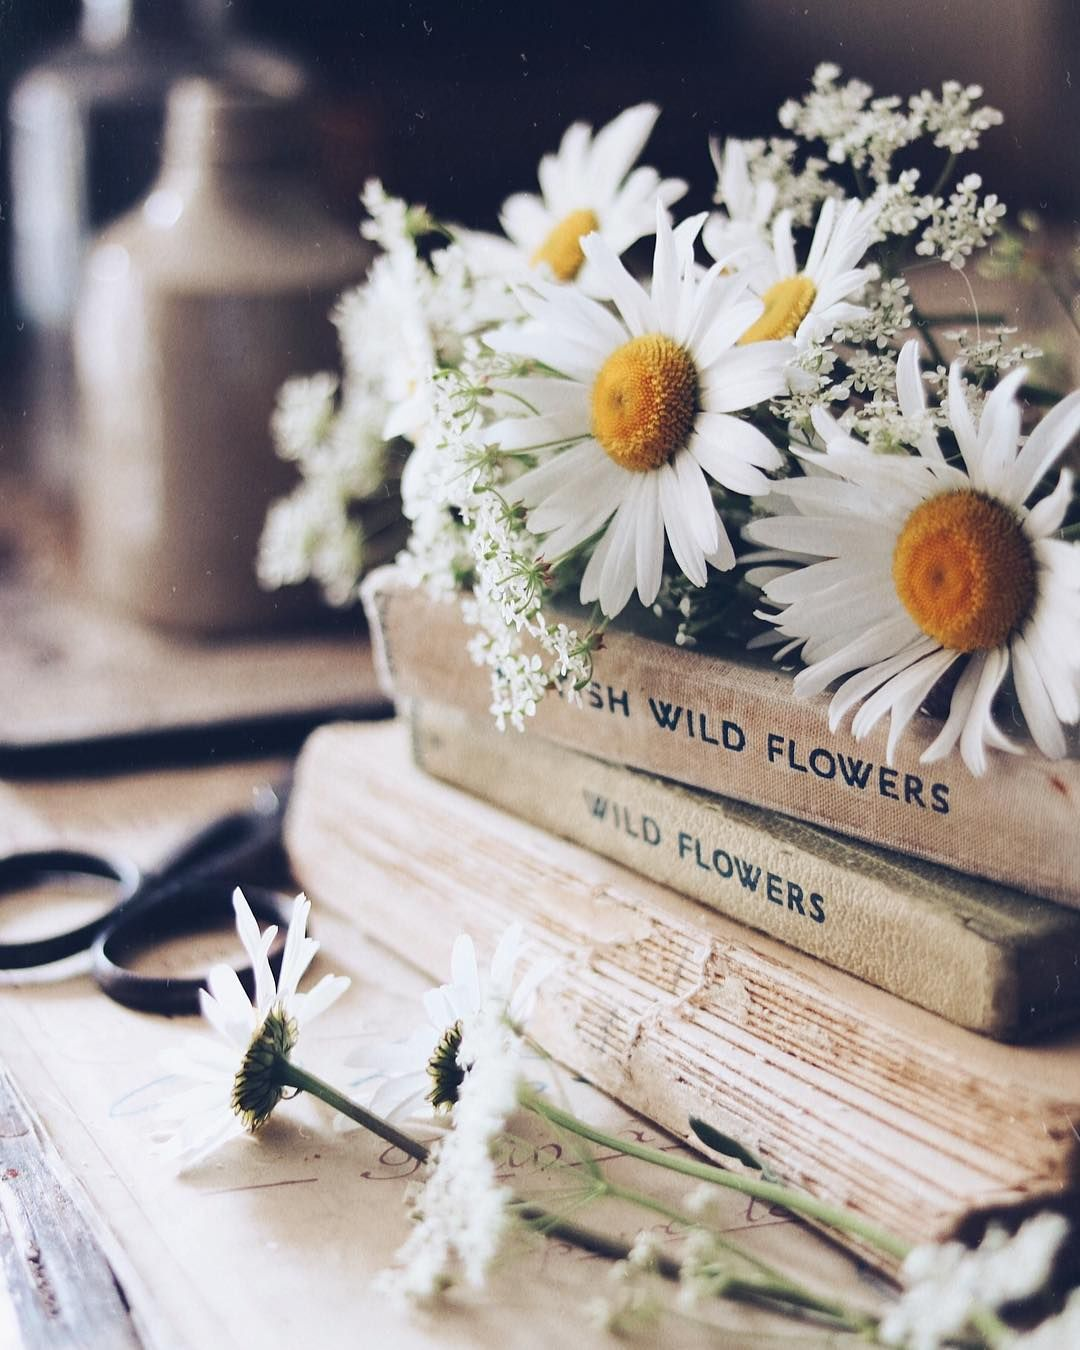 Polubienia 8 237 Komentarze 121 Karen Permillion44 Na Instagramie All Good Things Are Wild Free Book Flowers Flower Aesthetic Book Photography